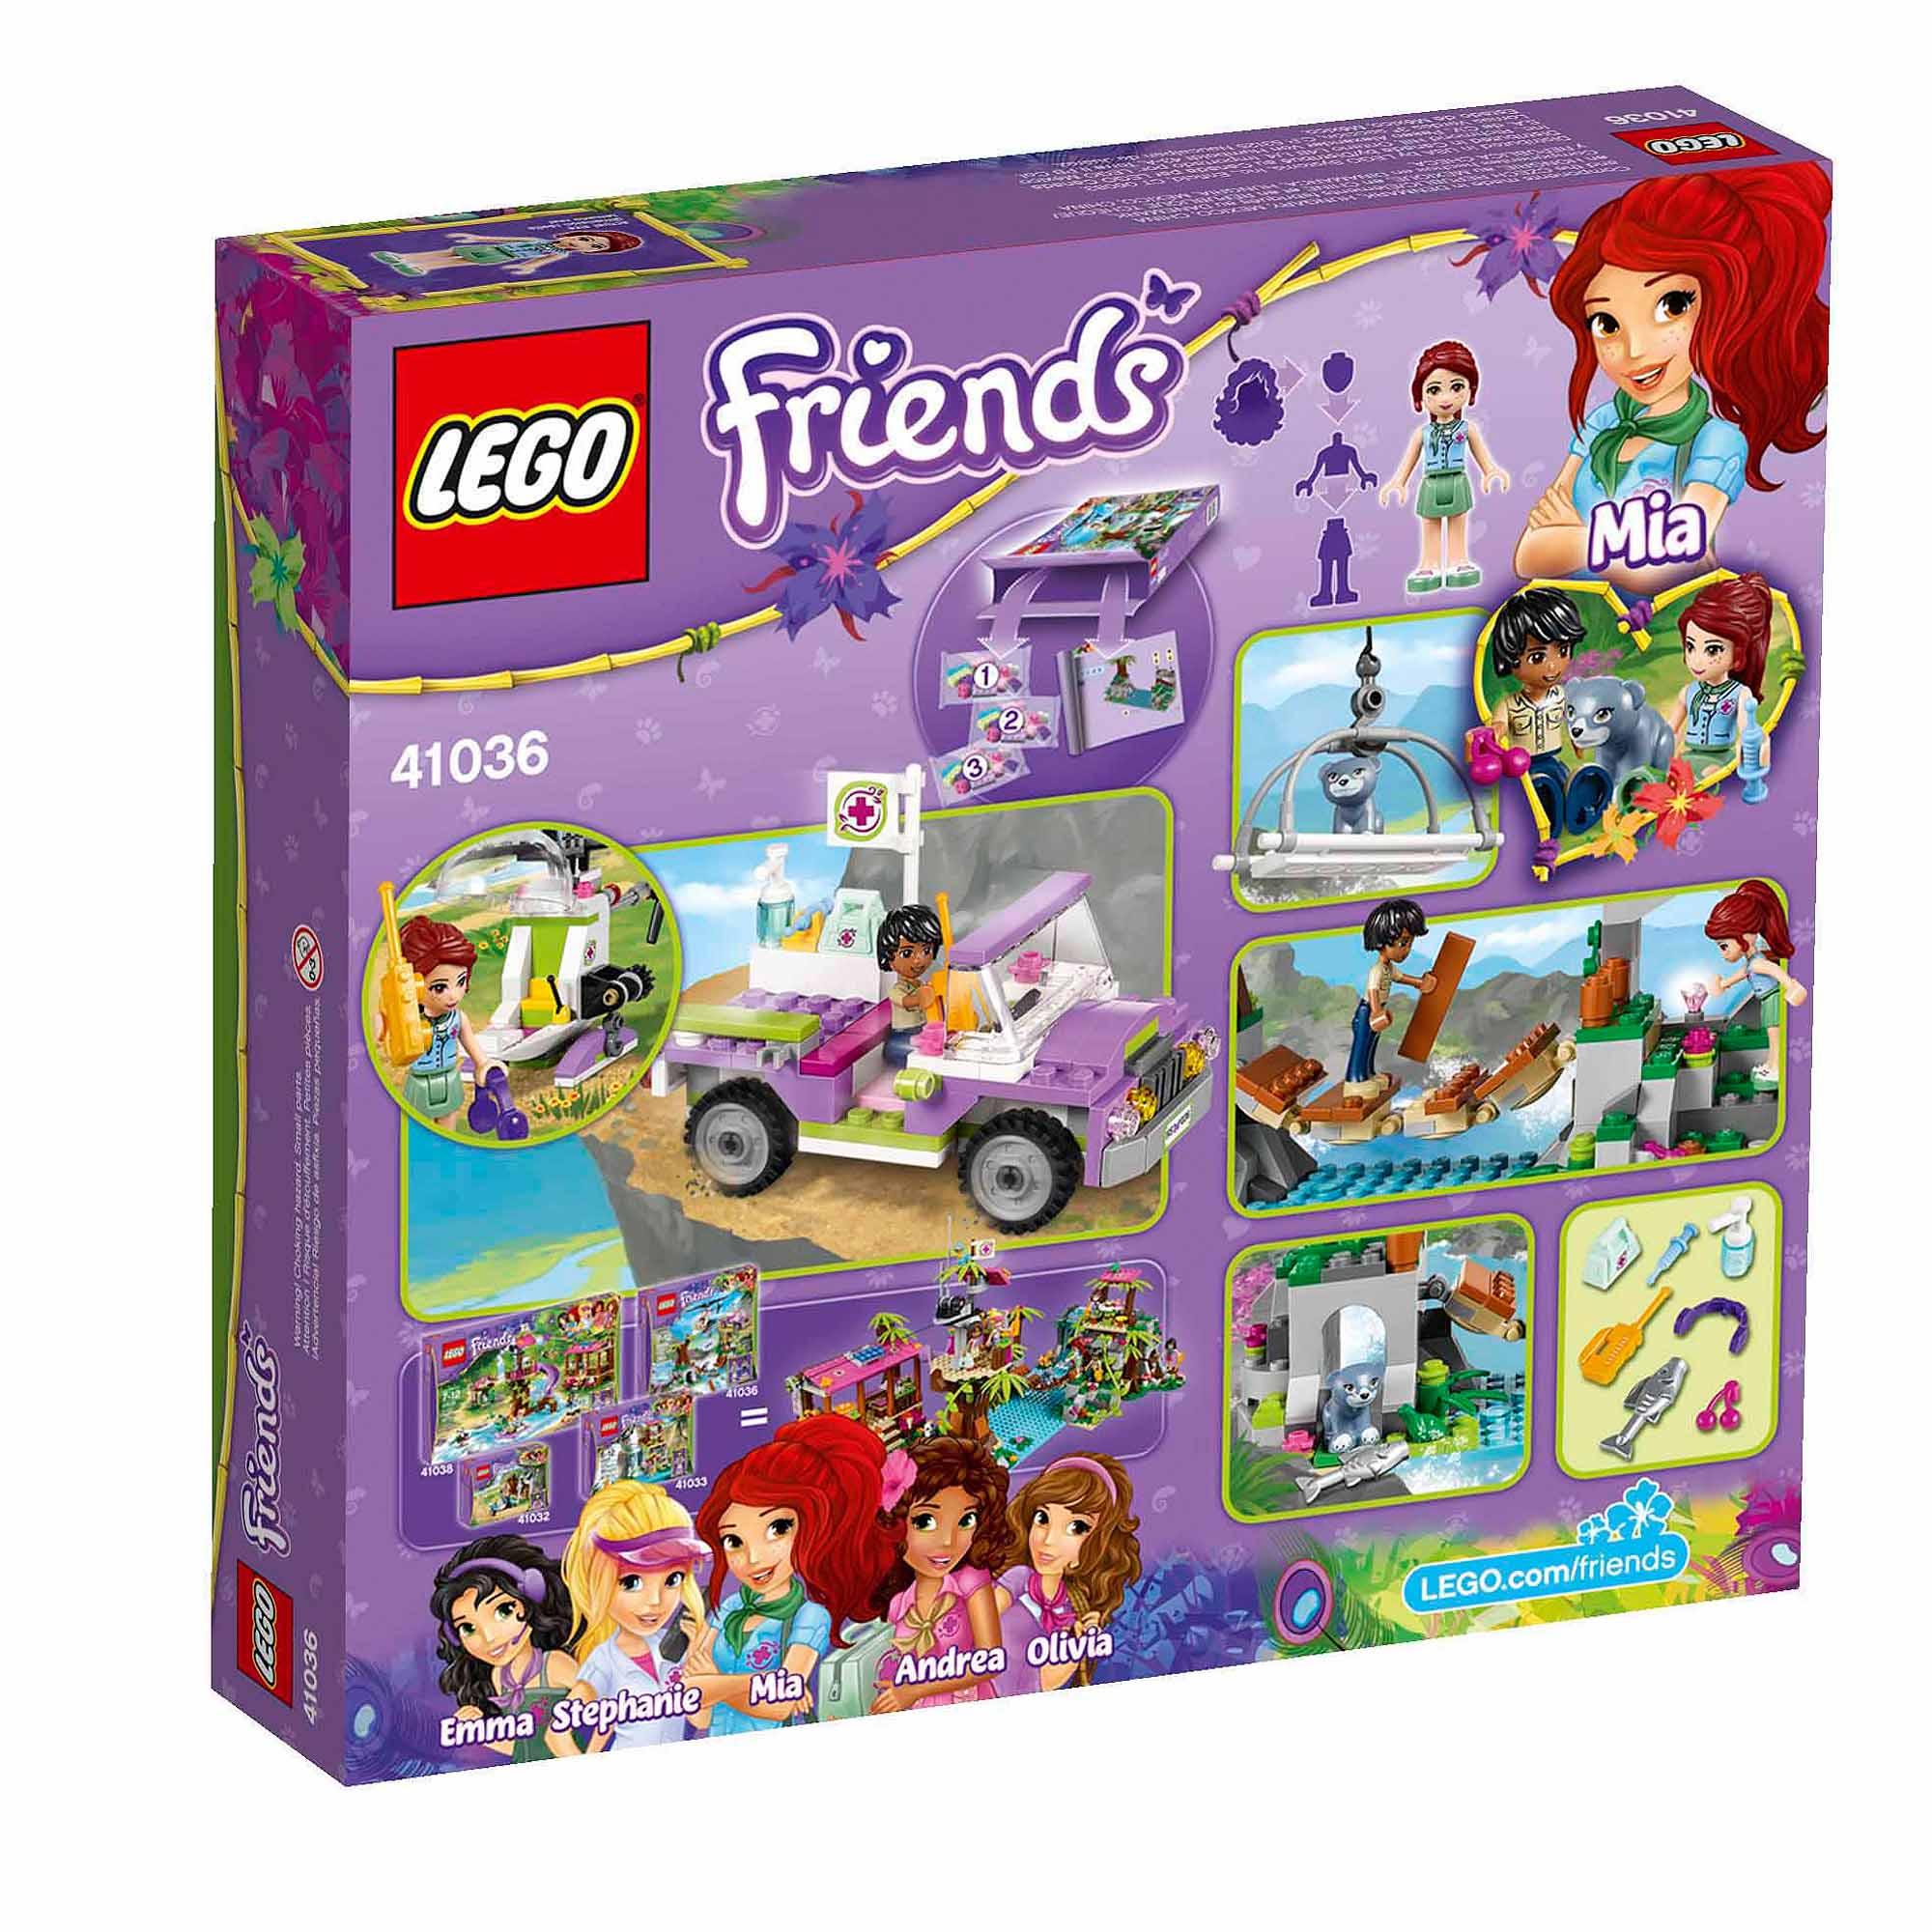 LEGO Friends Jungle Bridge Rescue - Walmart.com